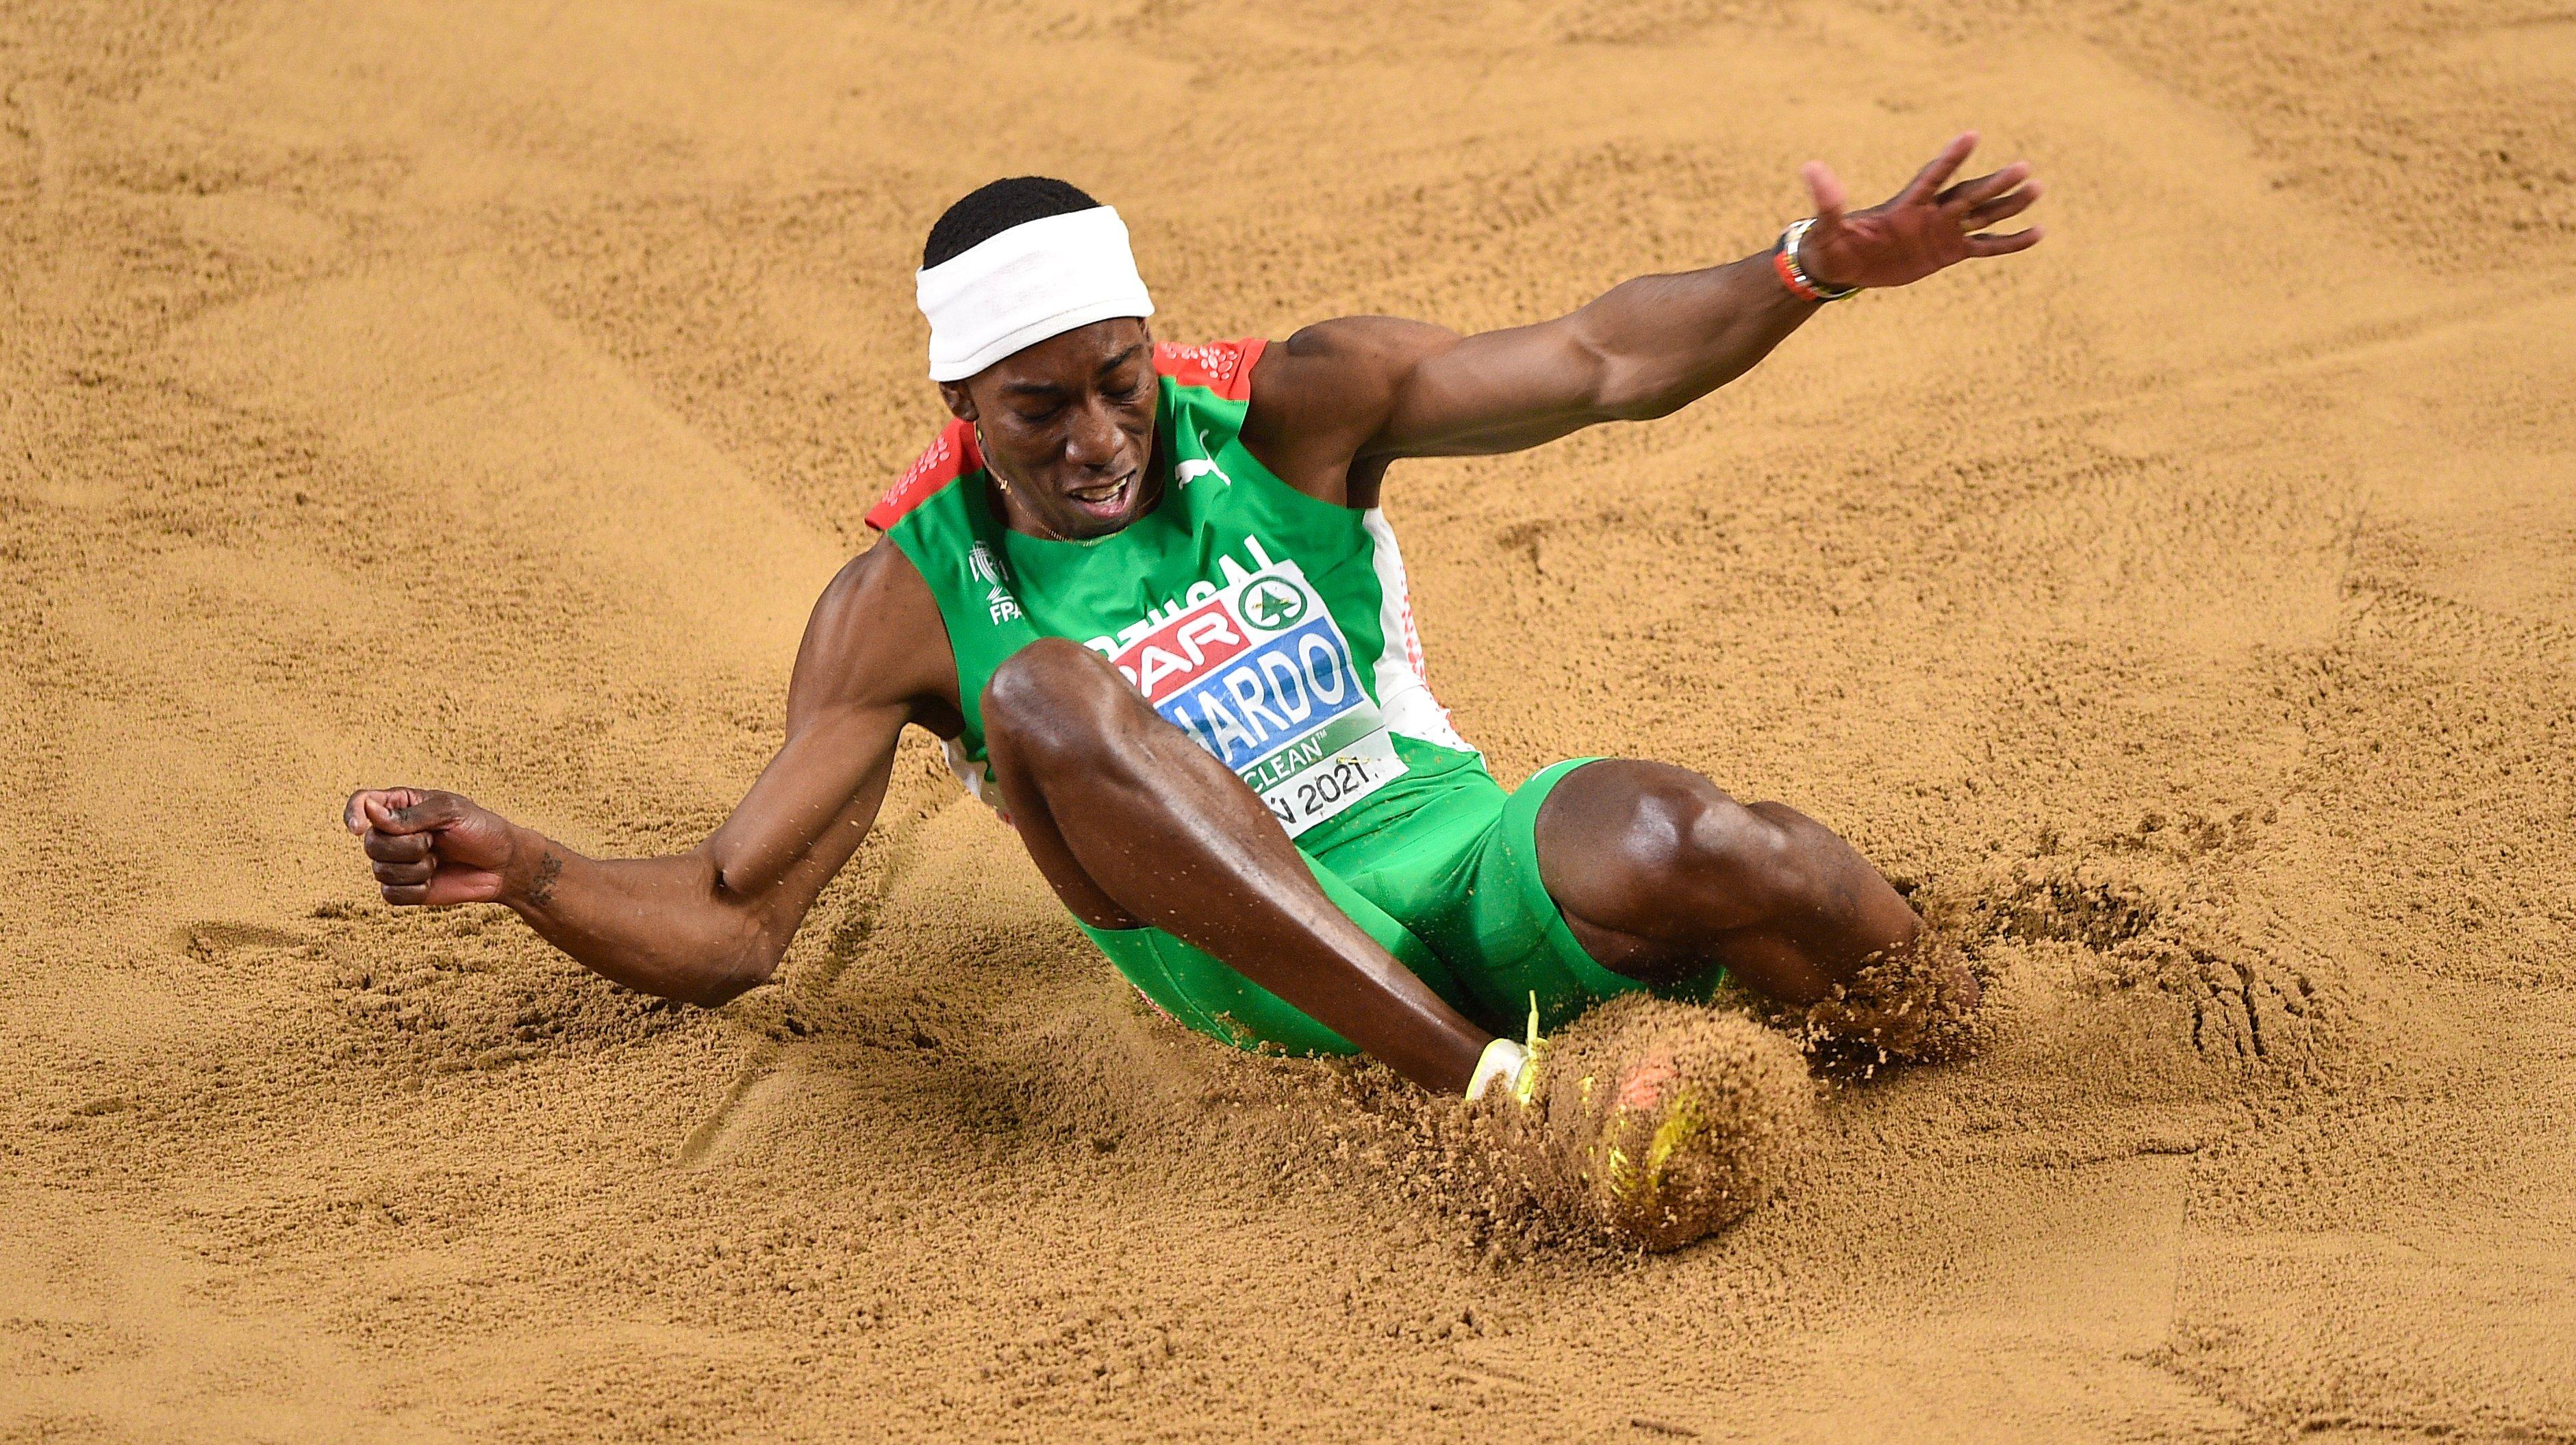 European Athletics Indoor Championships - Day 3 Session 1